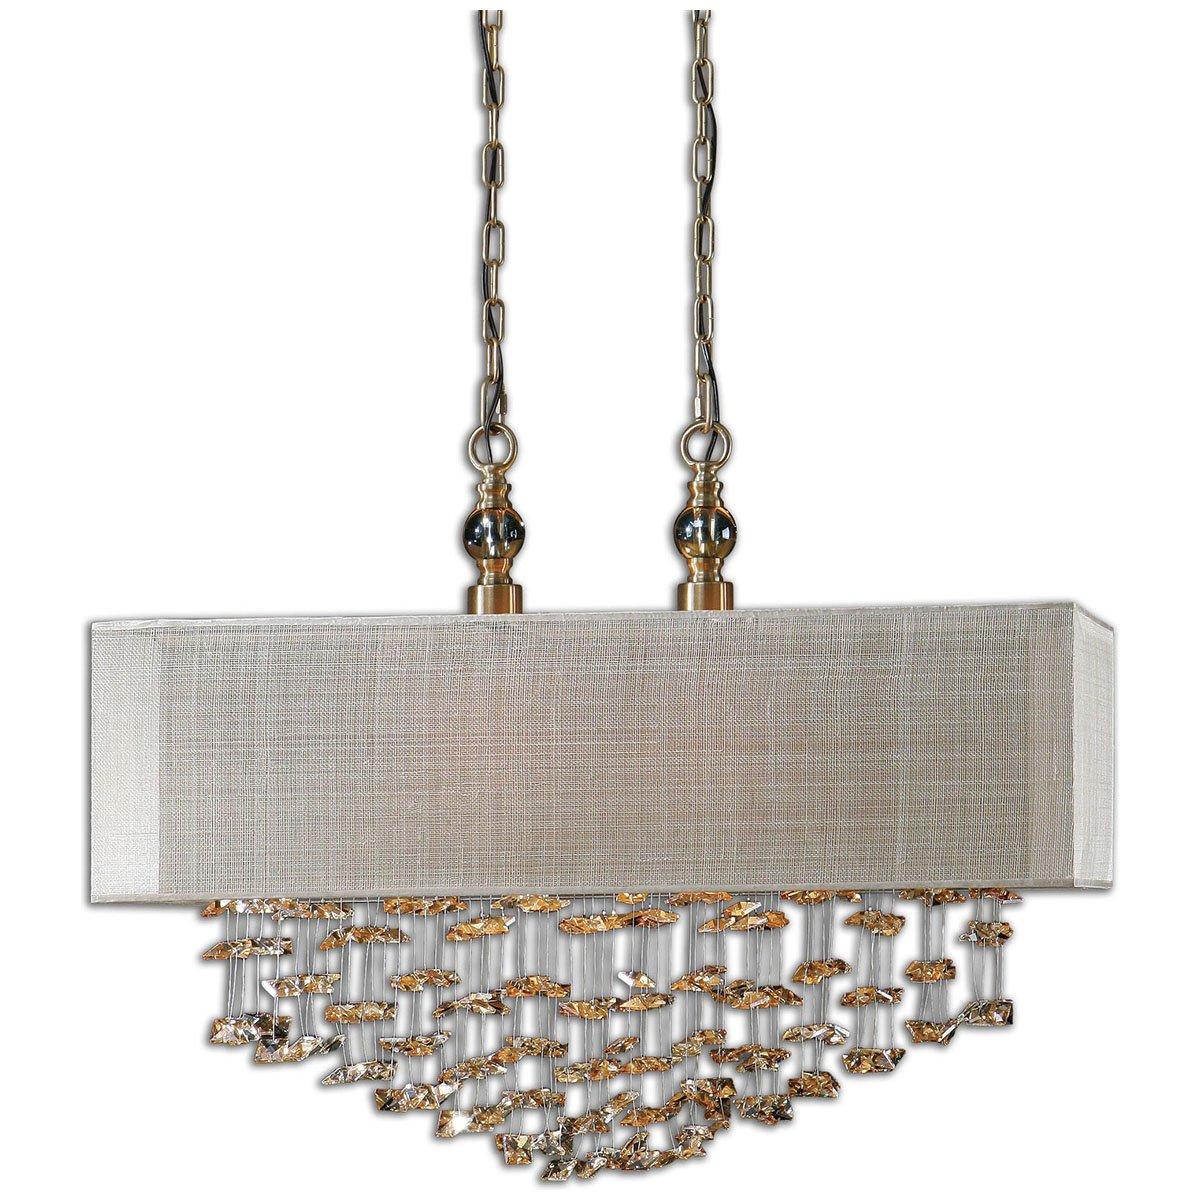 amazoncom uttermost santina 2 light shade pendant home u0026 kitchen - Uttermost Lighting